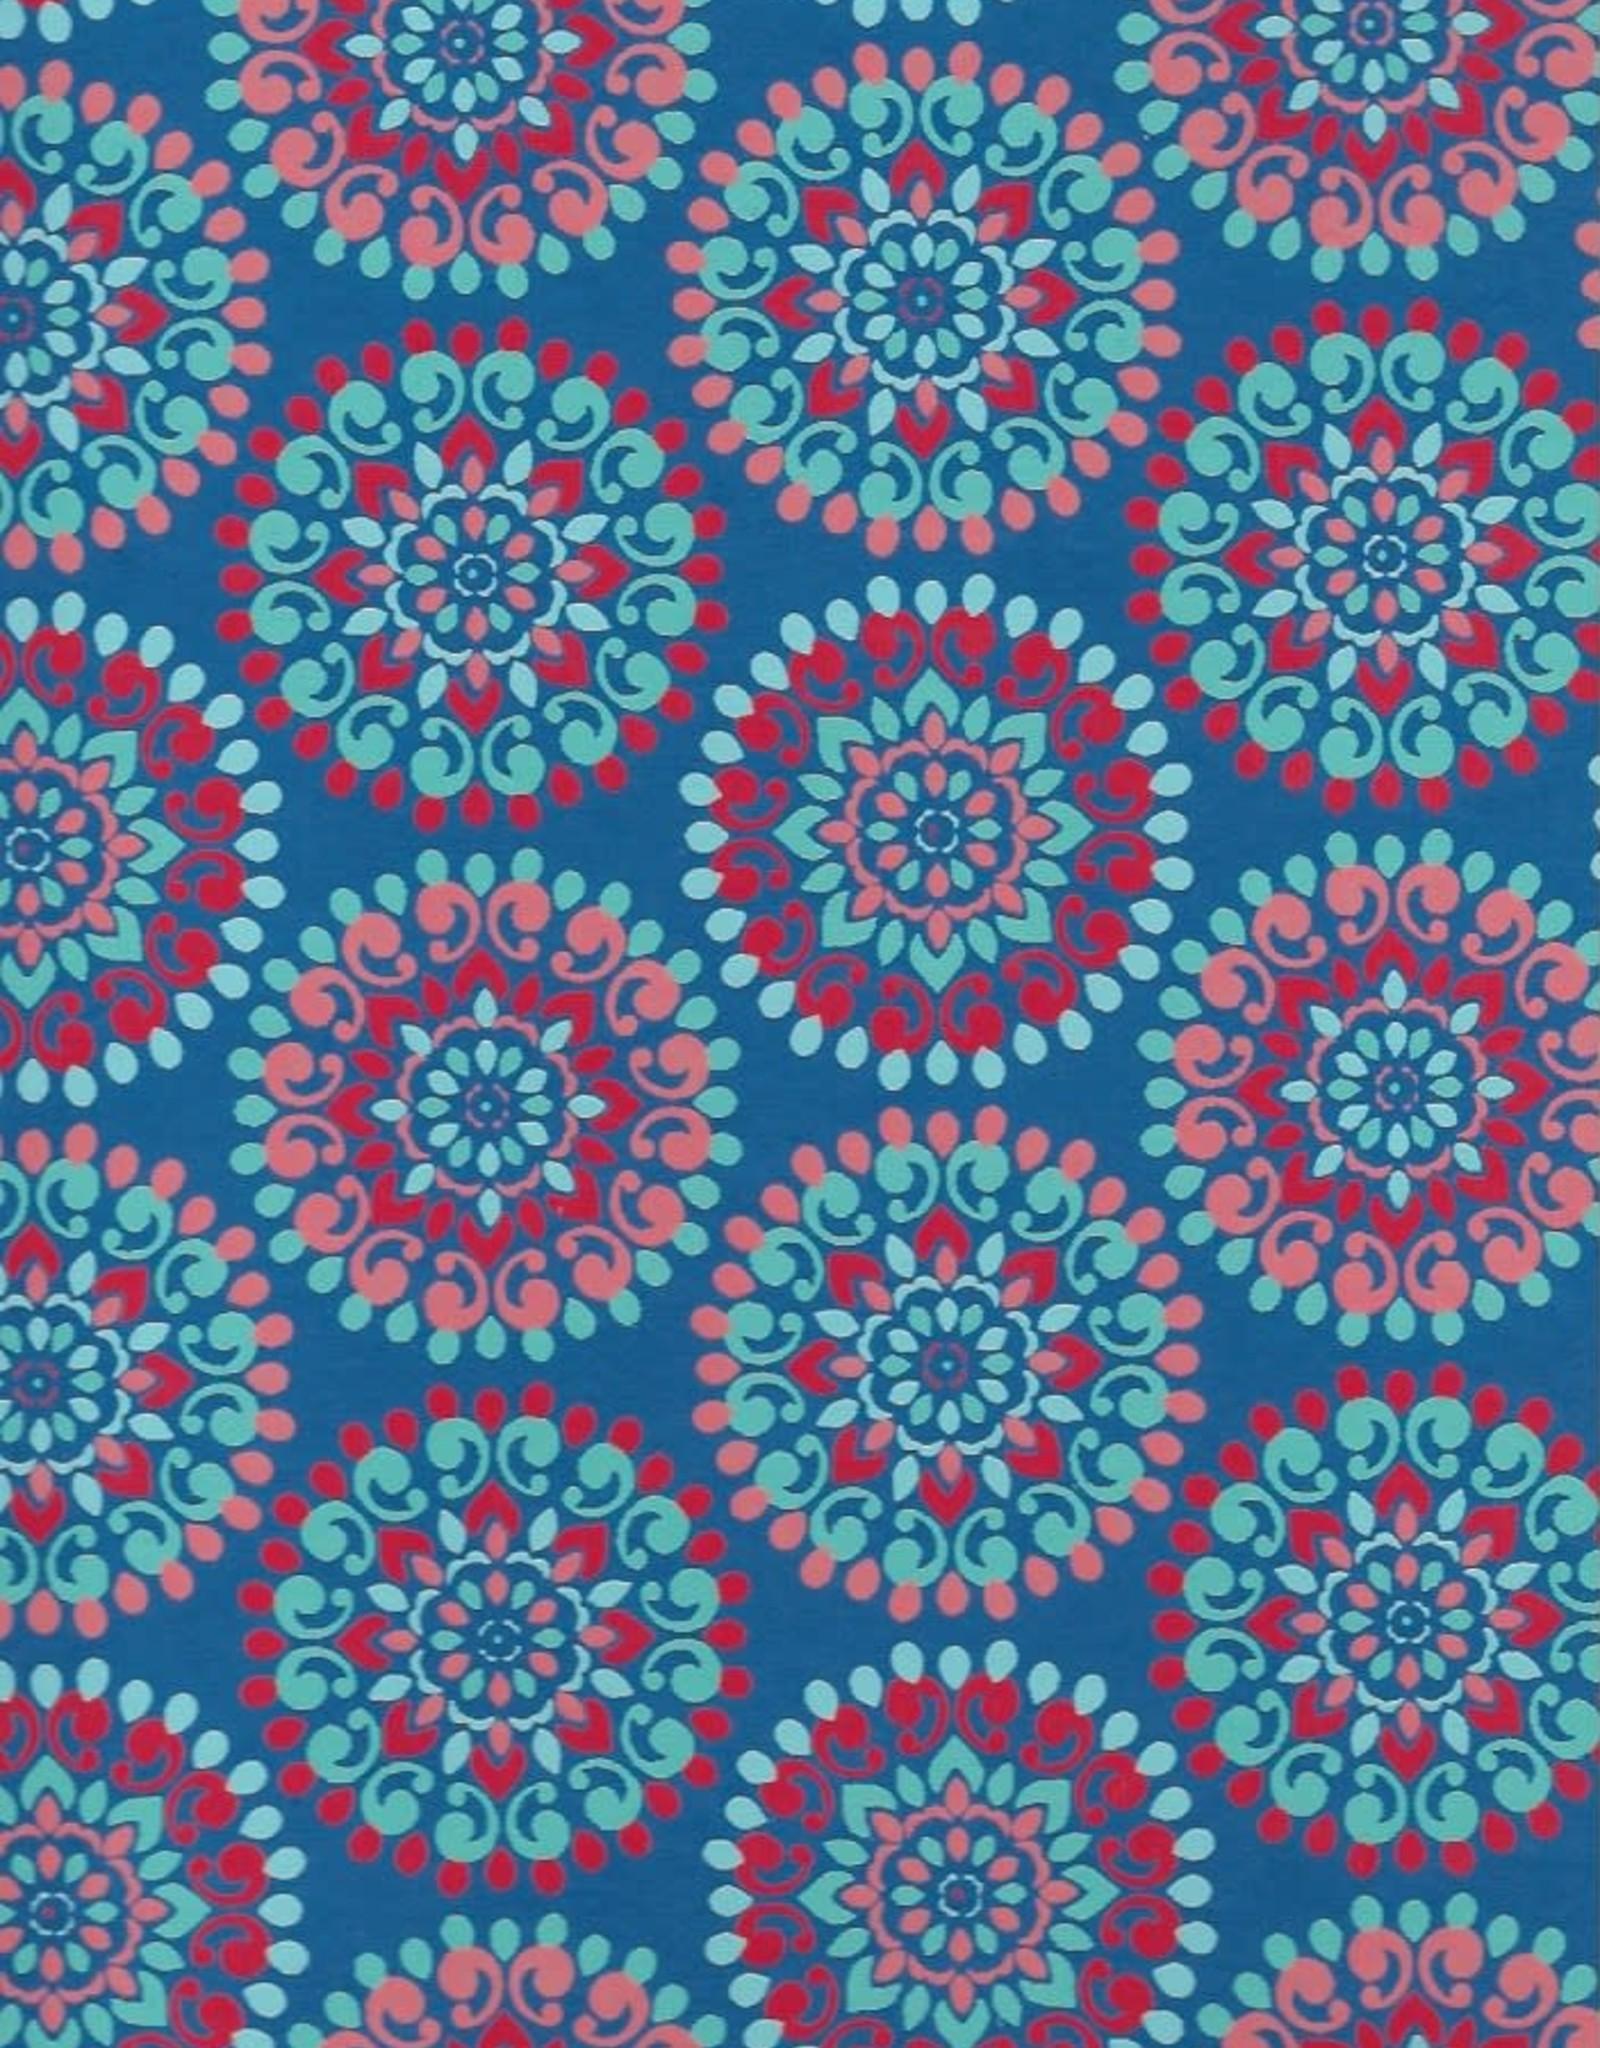 "Flower Mandalas, Light Blue, Red, Pink on Blue, 22"" x 30"""